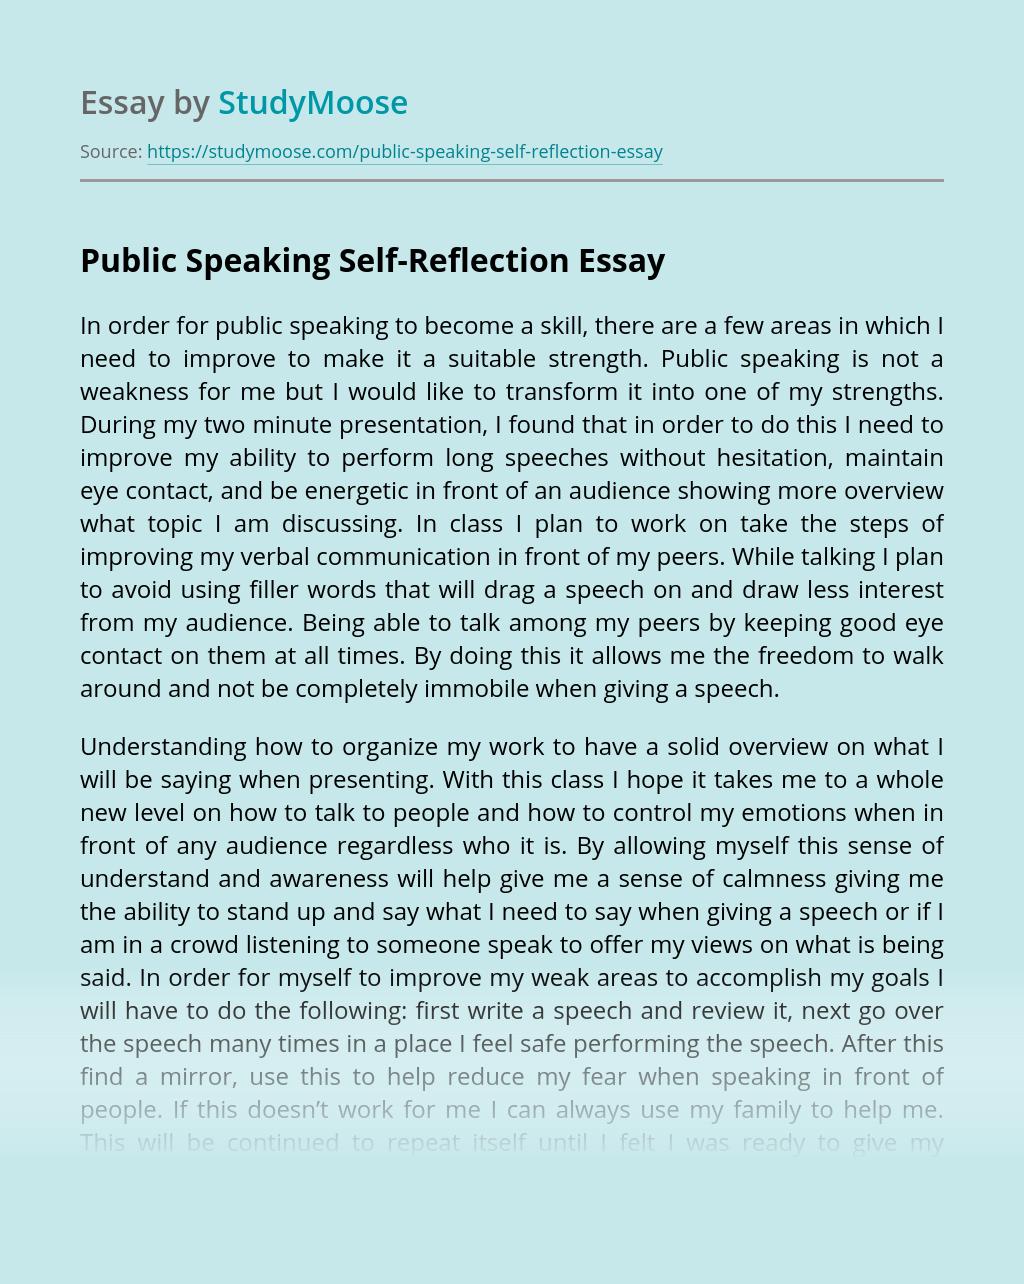 Public Speaking Self-Reflection